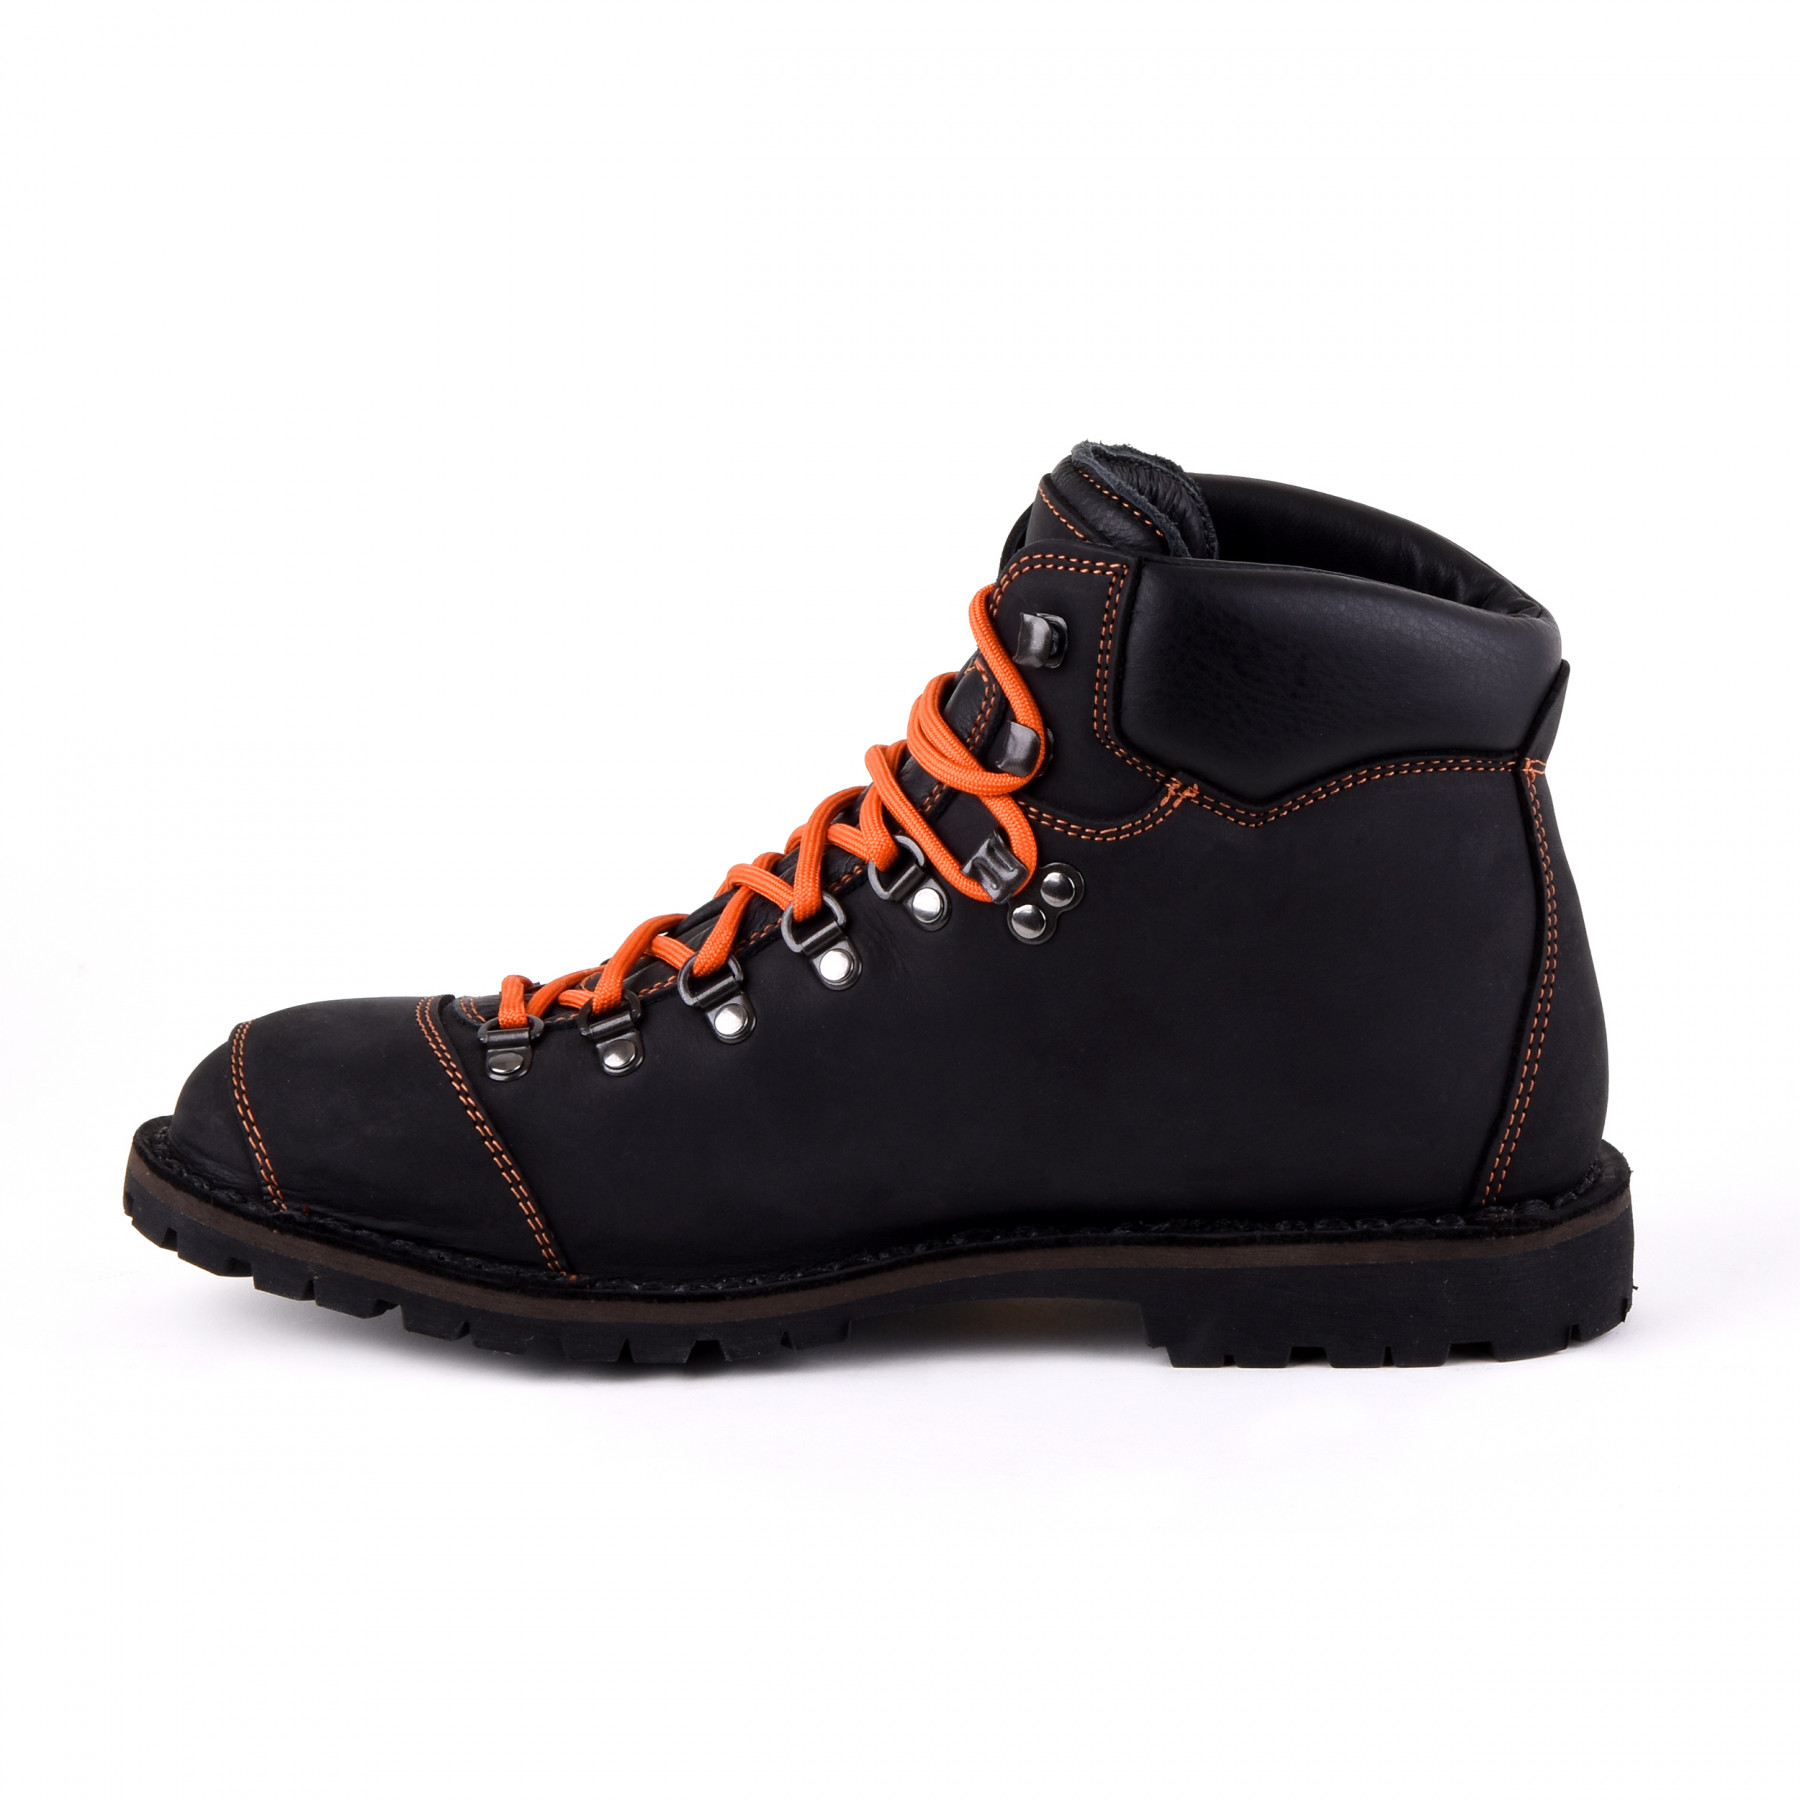 Biker Boot Adventure Denver Black, schwarze Herren Stiefel, orange Nähte